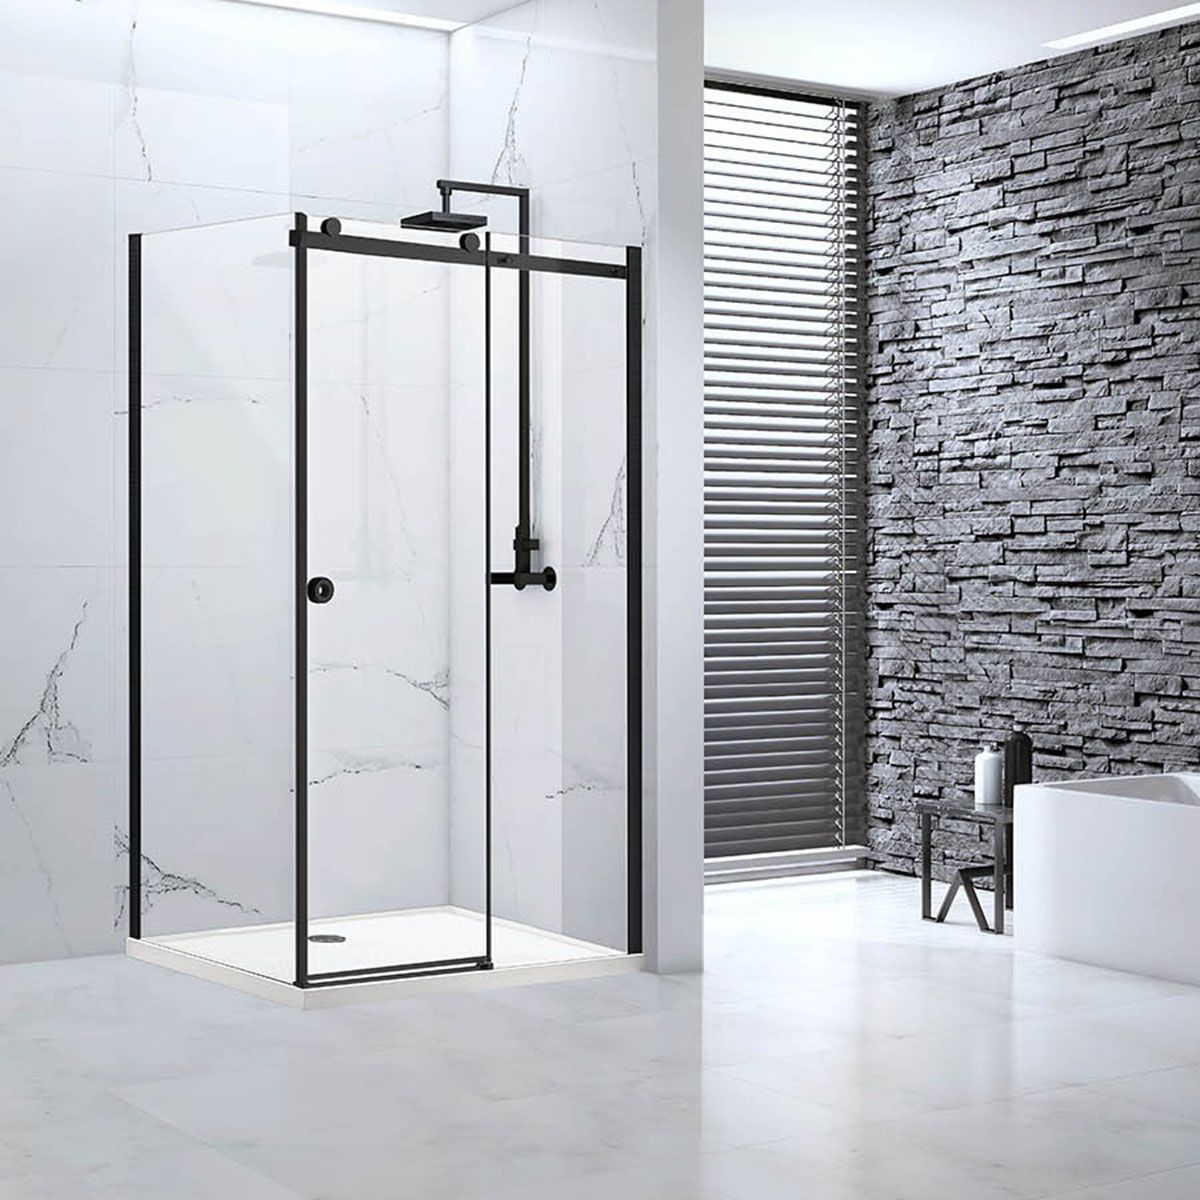 Frontline Aquaglass Sphere Black Sliding Shower Enclosure with Optional Side Panel